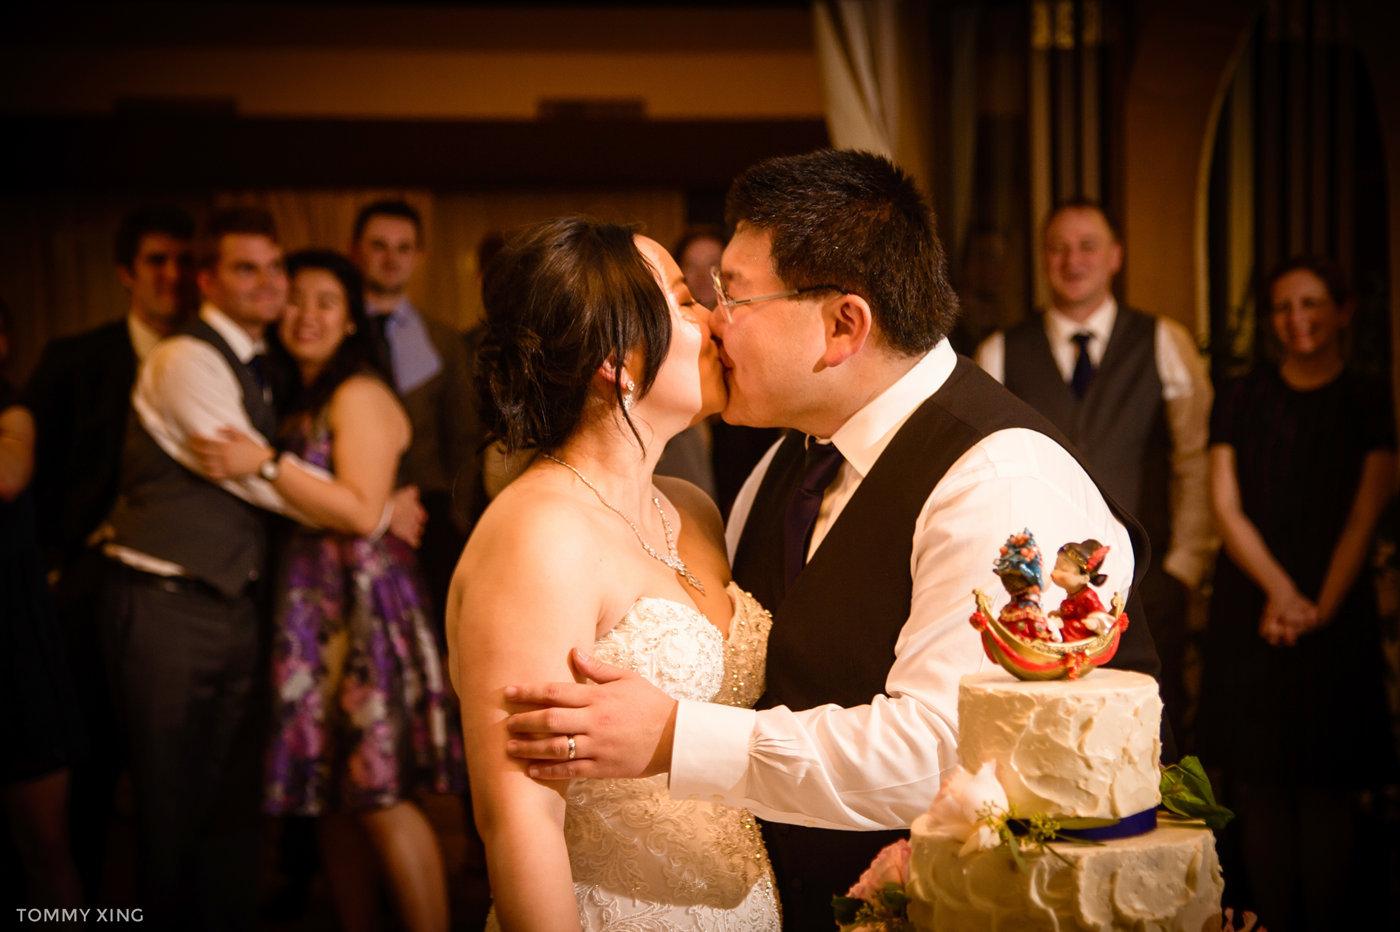 STANFORD MEMORIAL CHURCH WEDDING - Wenjie & Chengcheng - SAN FRANCISCO BAY AREA 斯坦福教堂婚礼跟拍 - 洛杉矶婚礼婚纱照摄影师 Tommy Xing Photography239.jpg